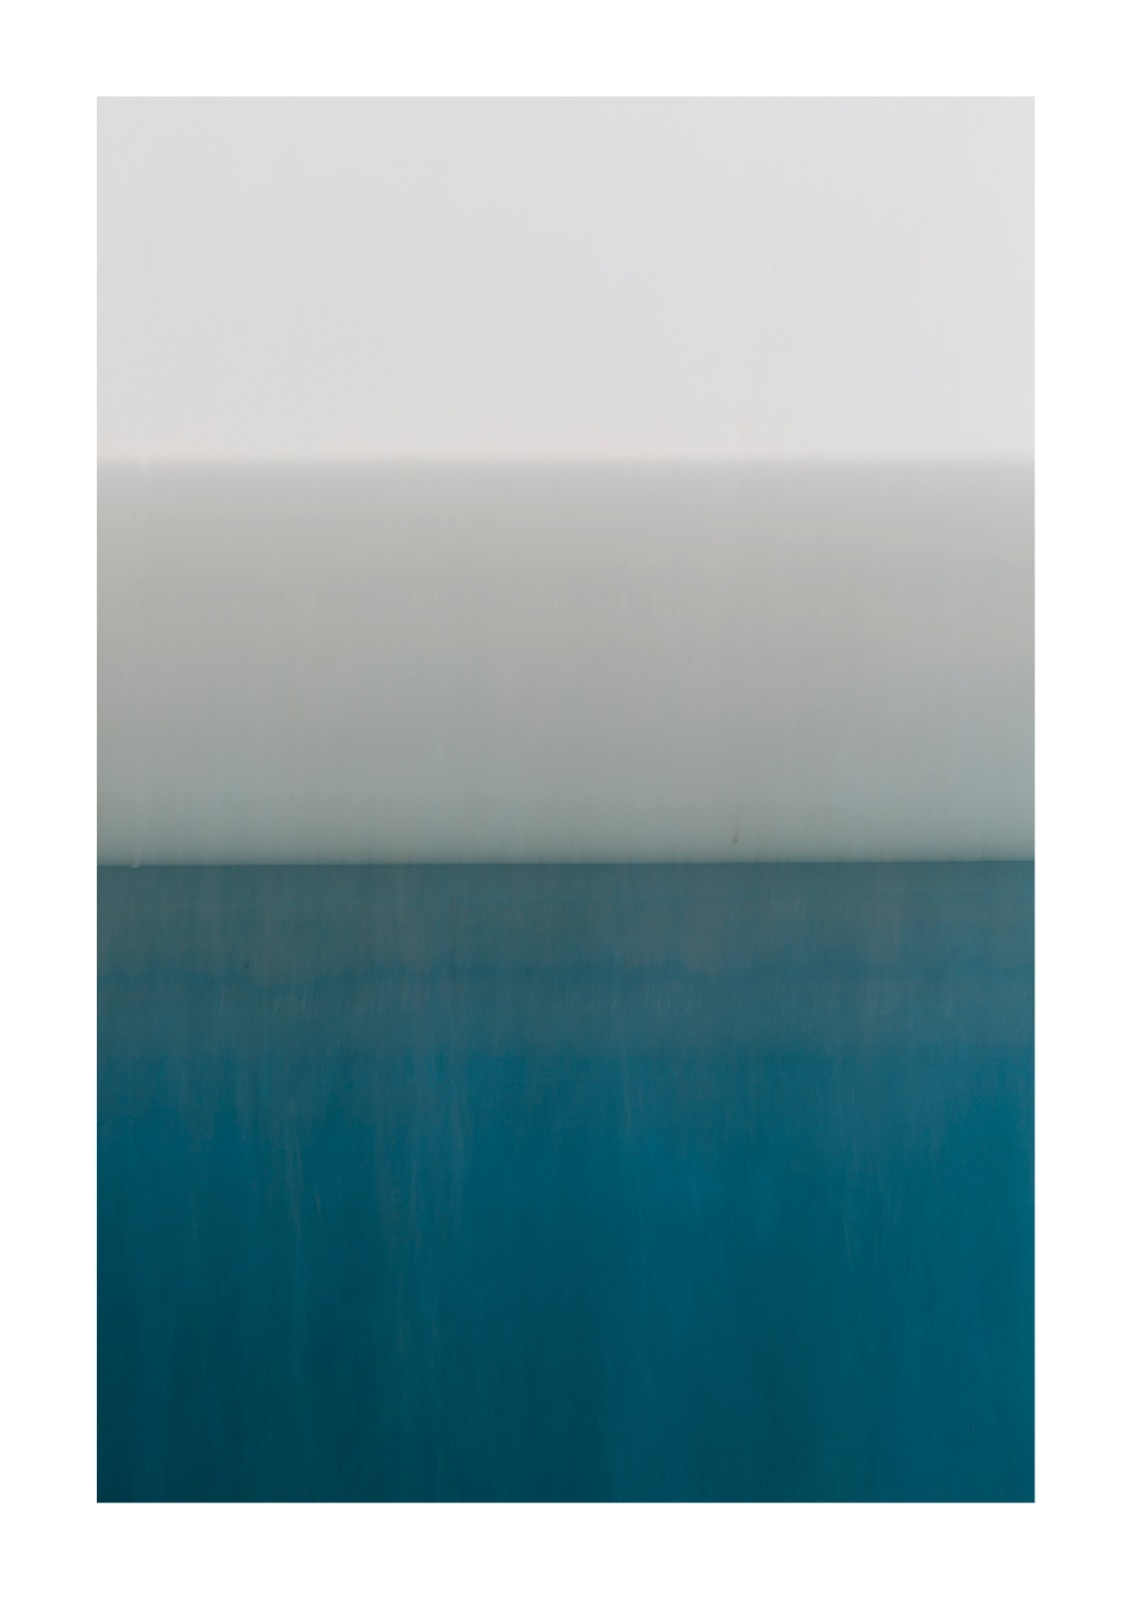 Blue No. 3 - Below The Waterline A4 Giclée Print